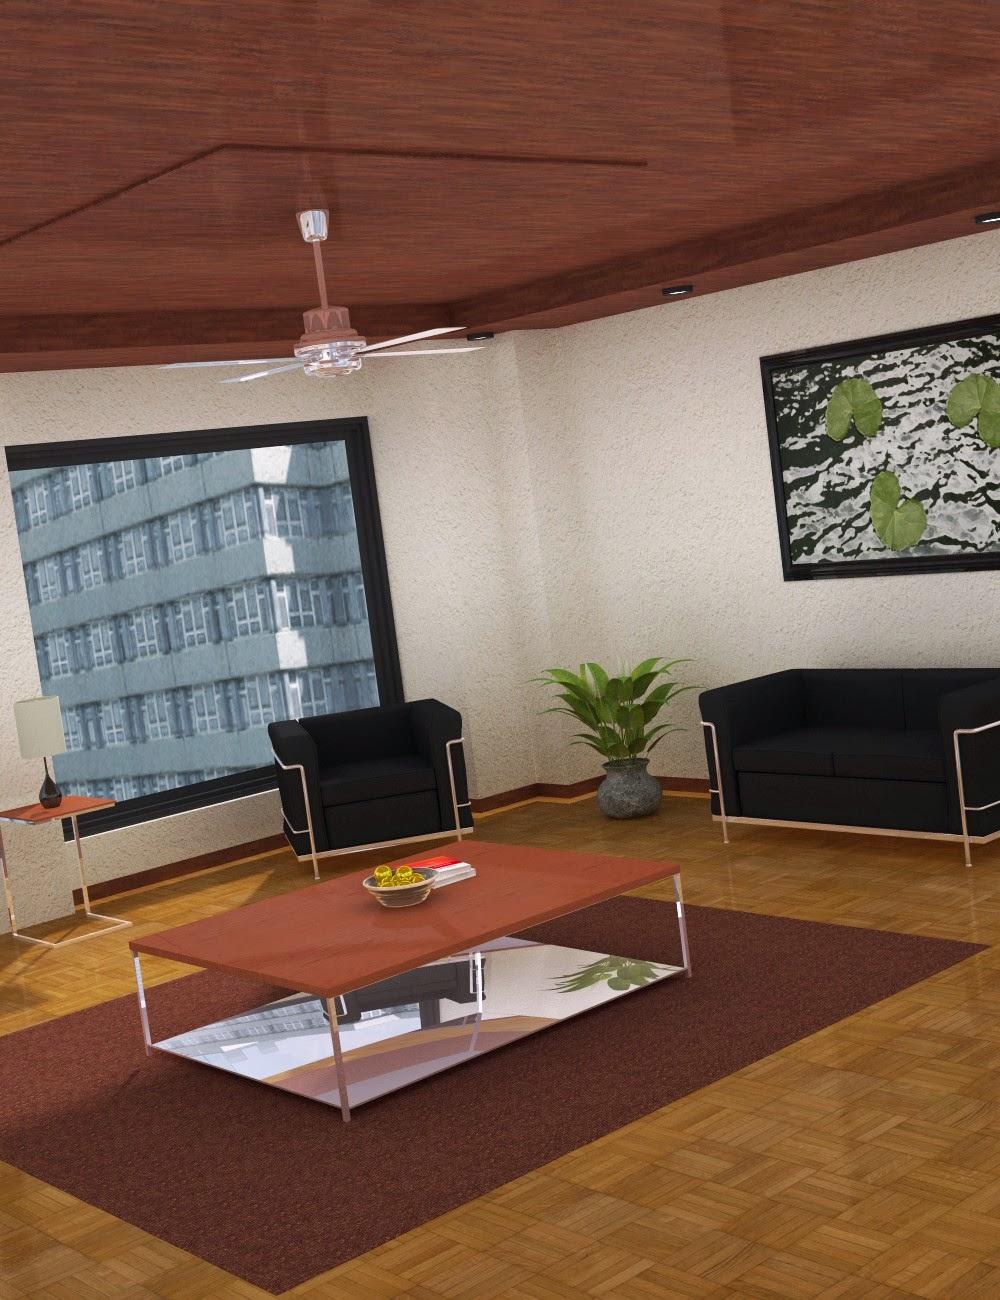 Download daz studio 3 for free daz 3d interior room for Living room 2 for daz studio